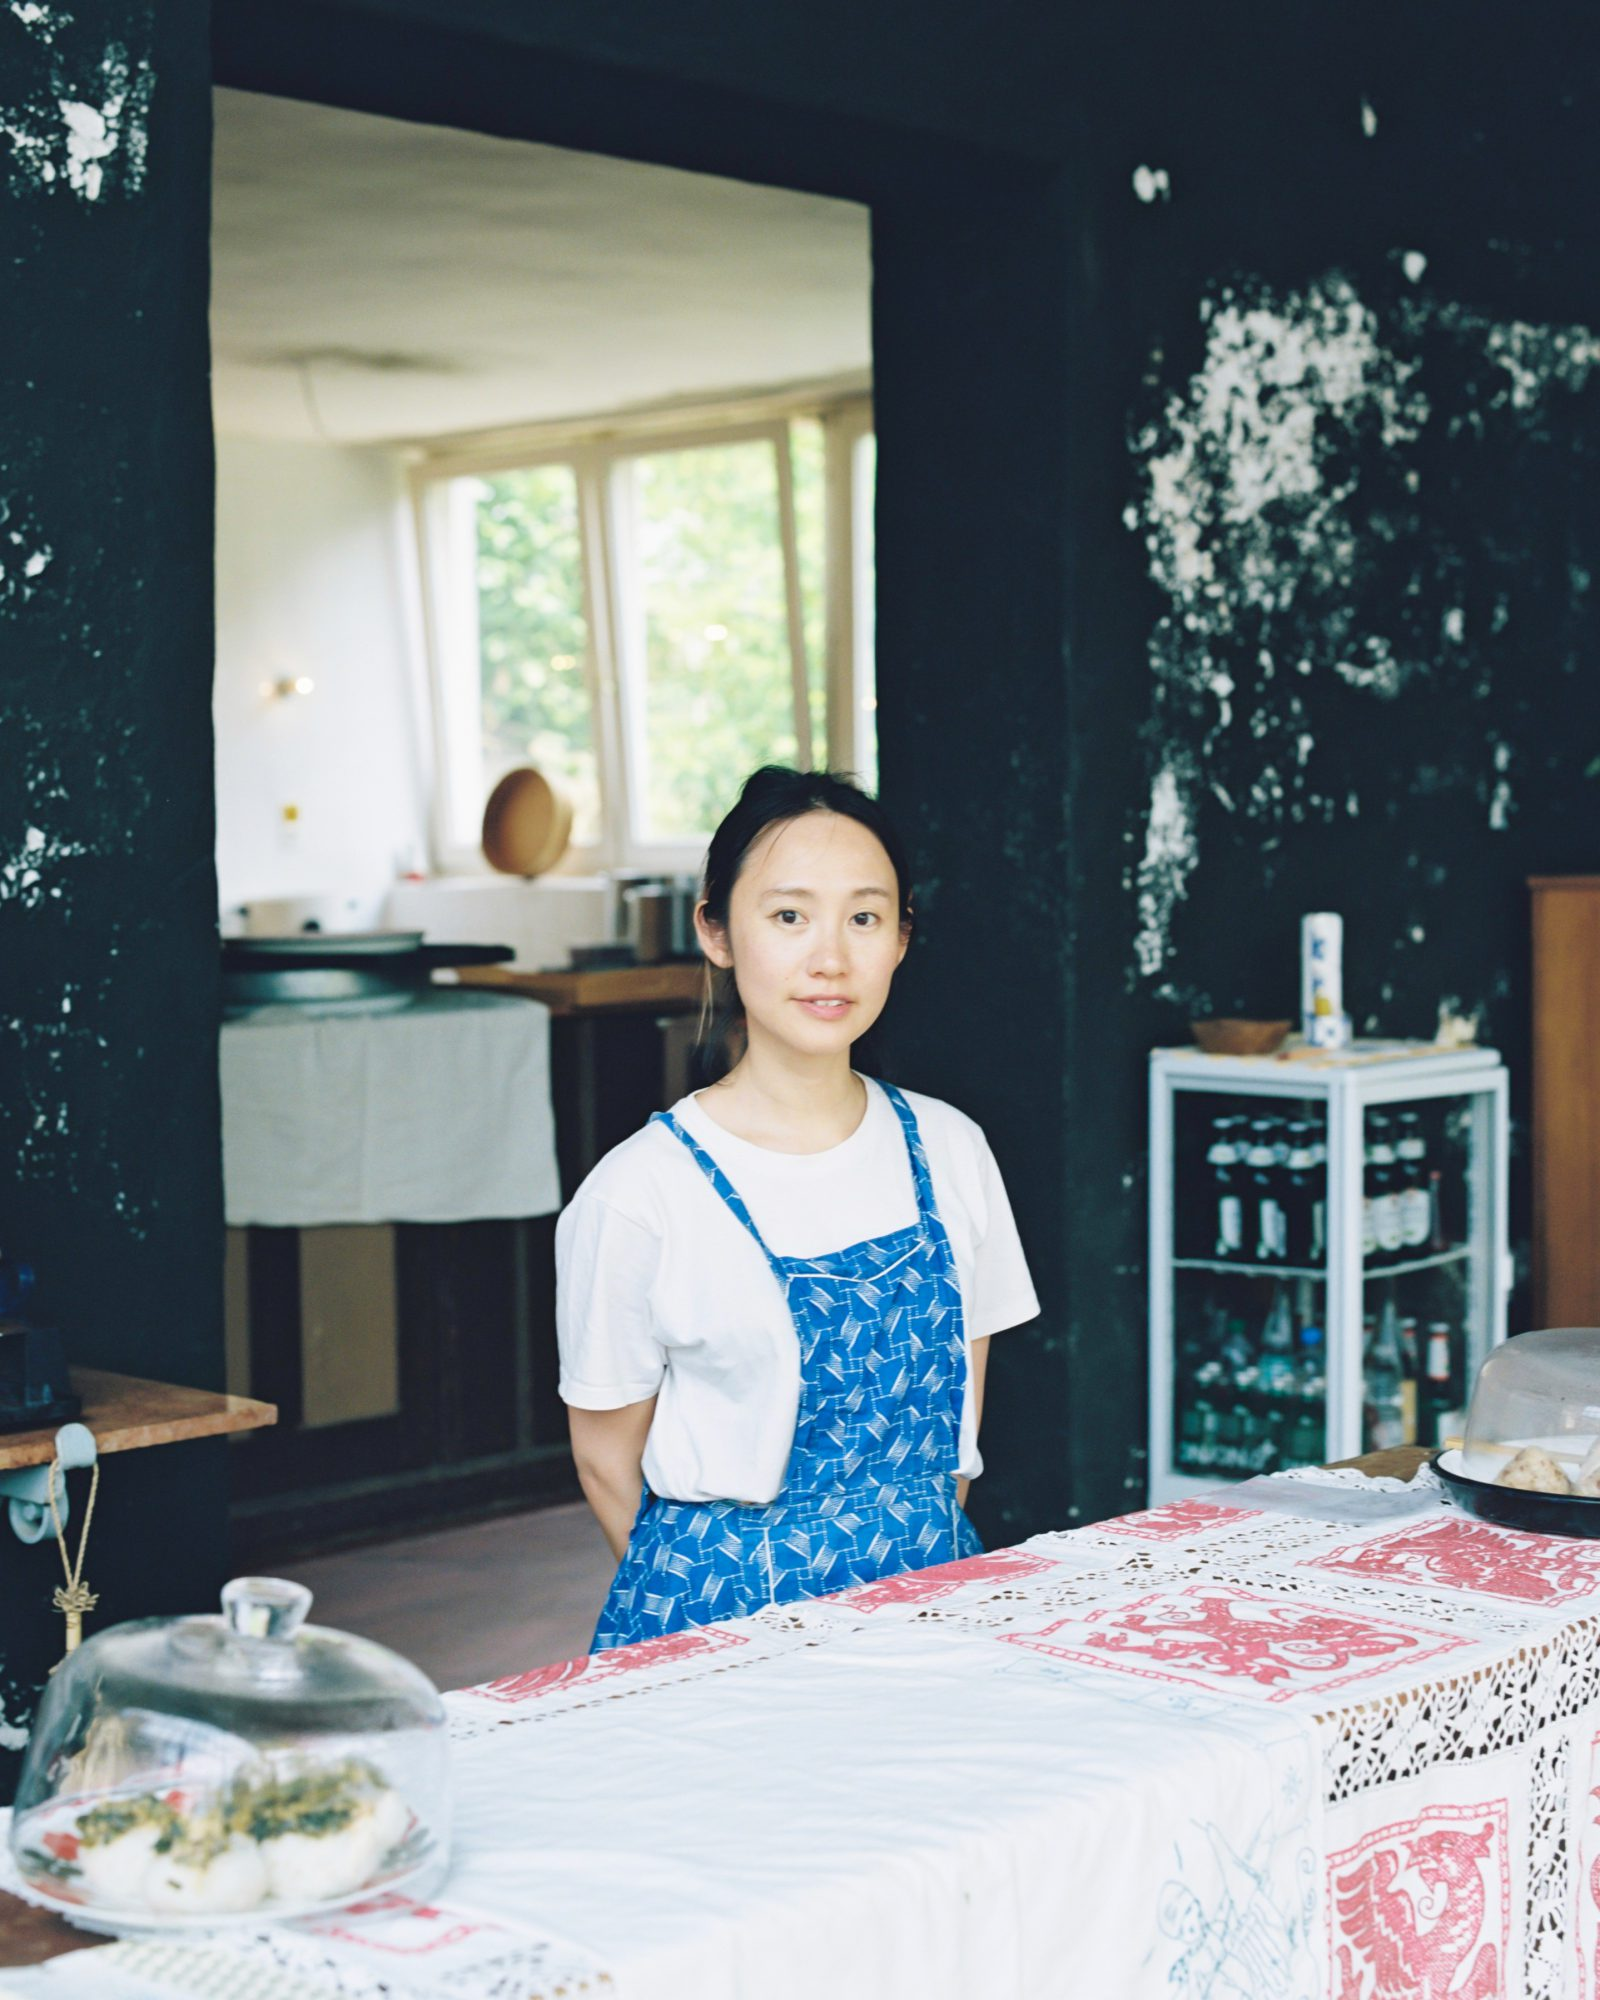 café zum löwen Sayuri Sakairi